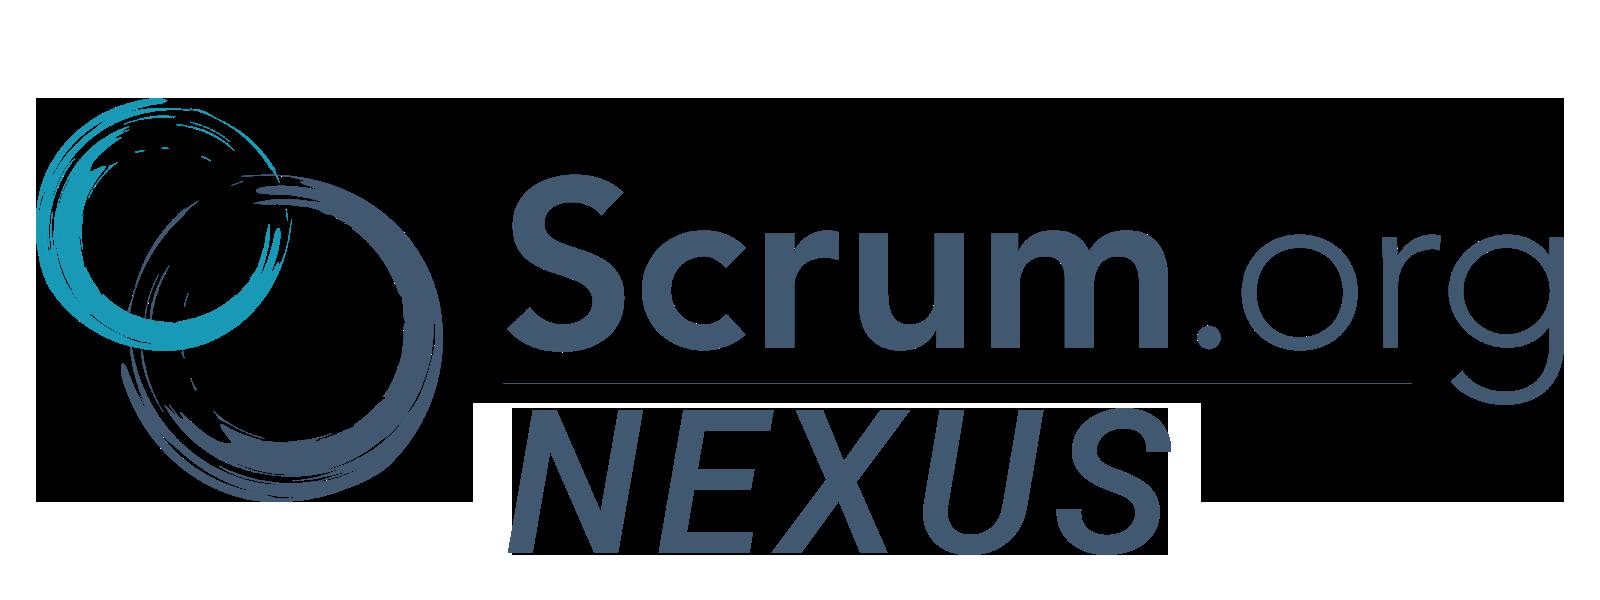 Nexus scrum